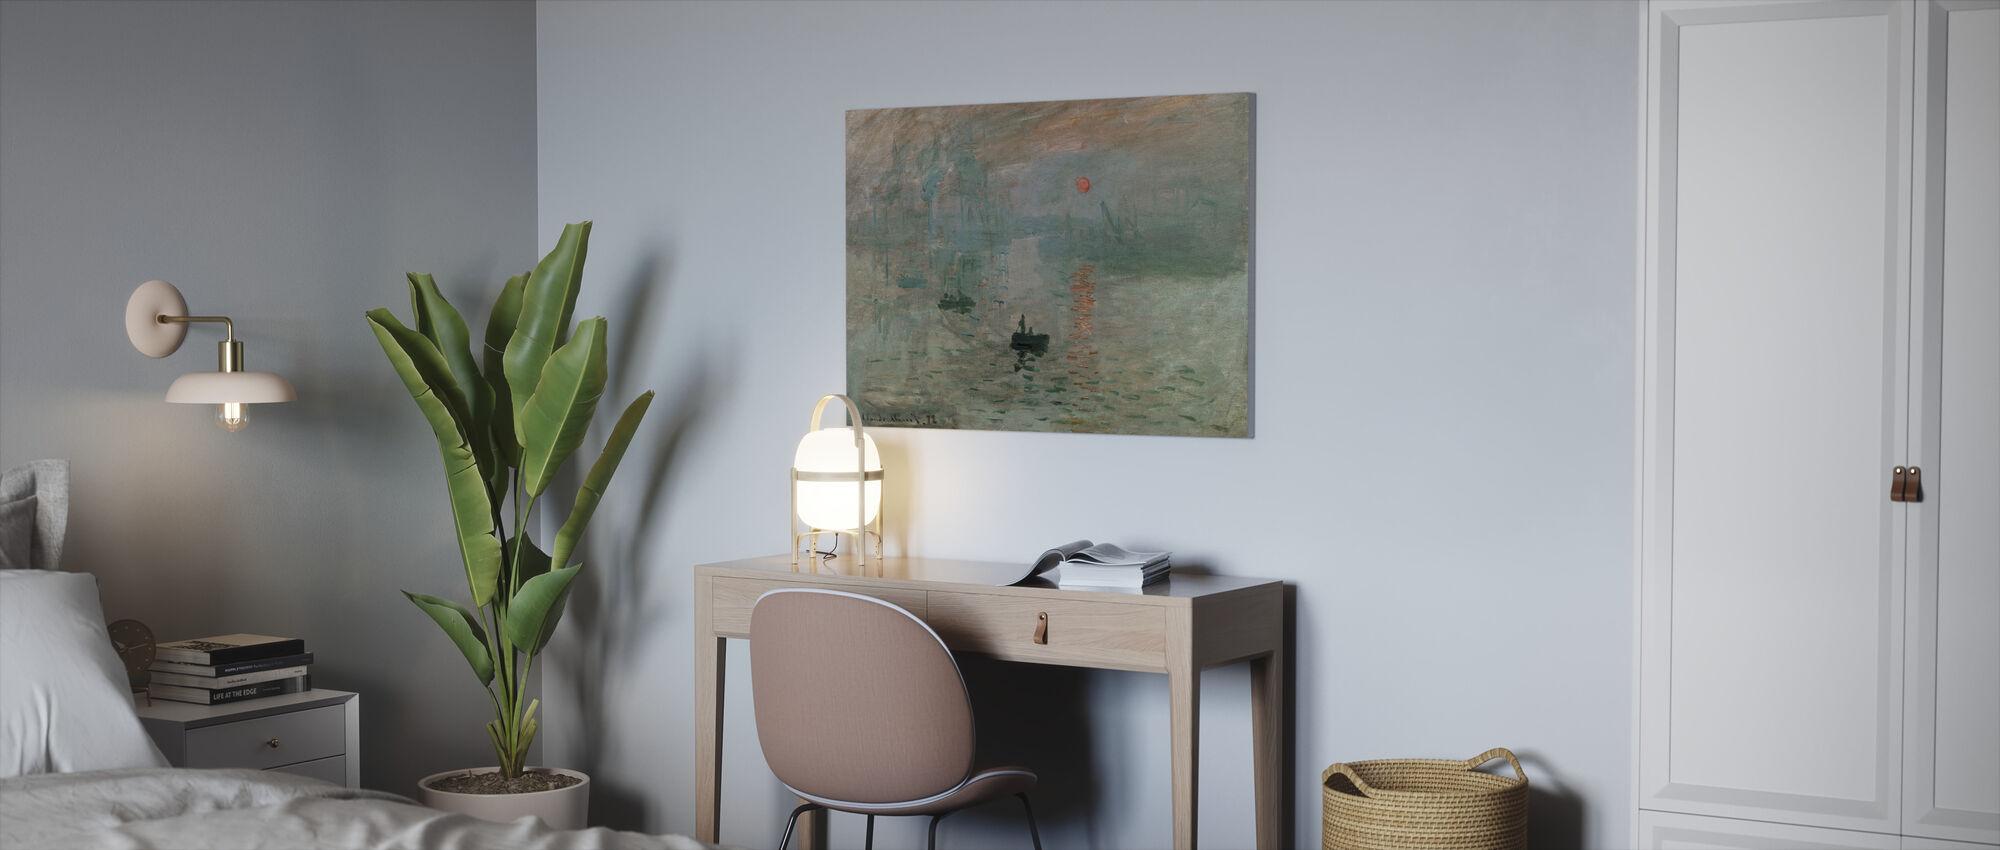 Monet, Claud - Intryck - Canvastavla - Kontor